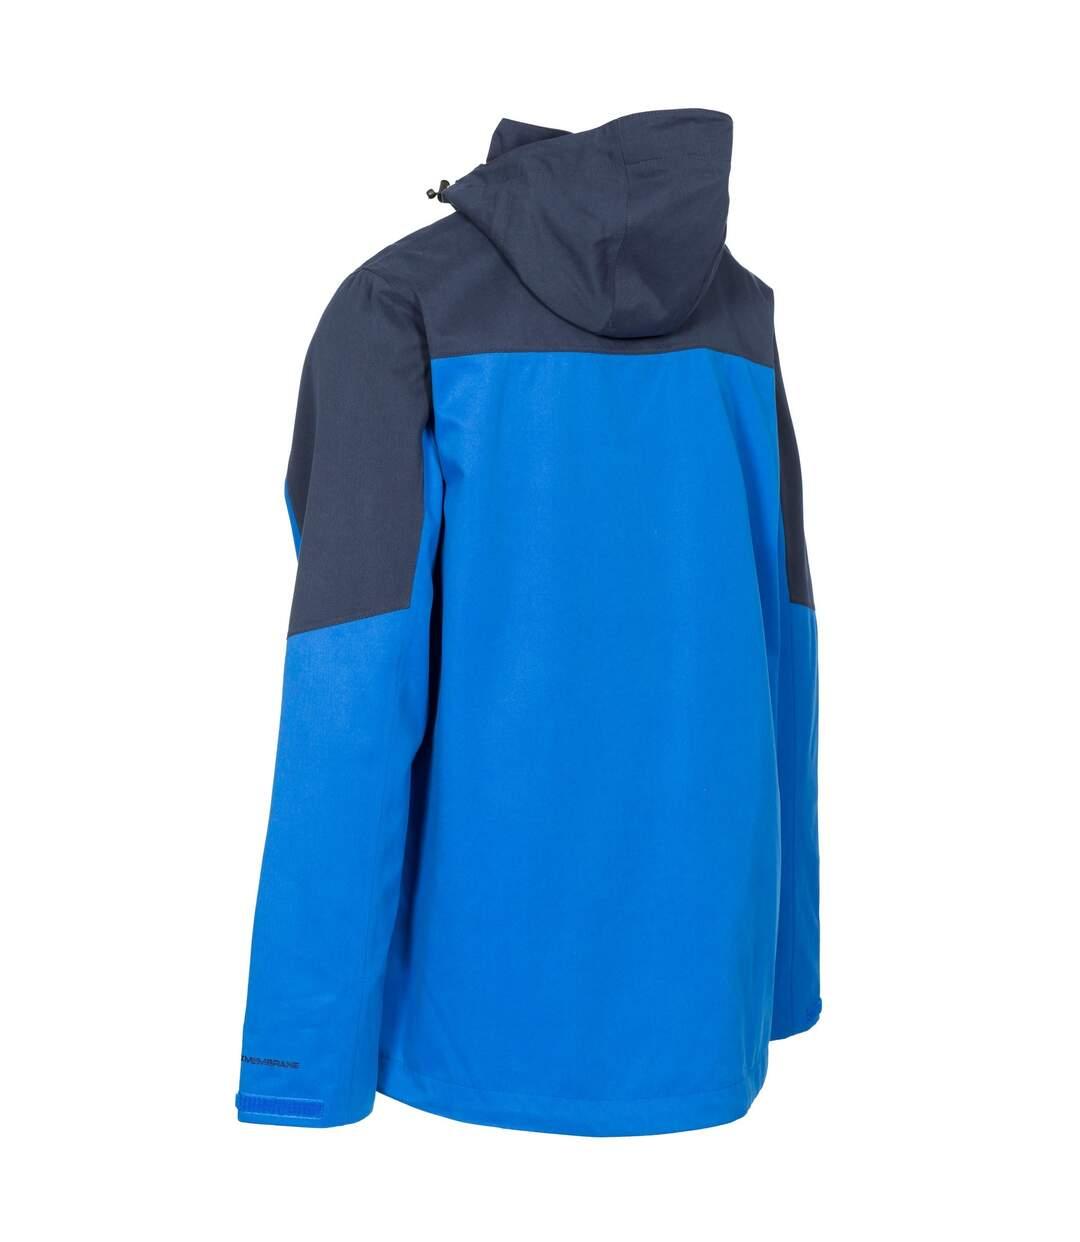 Trespass Mens Danson Waterproof Jacket (Blue) - UTTP4597